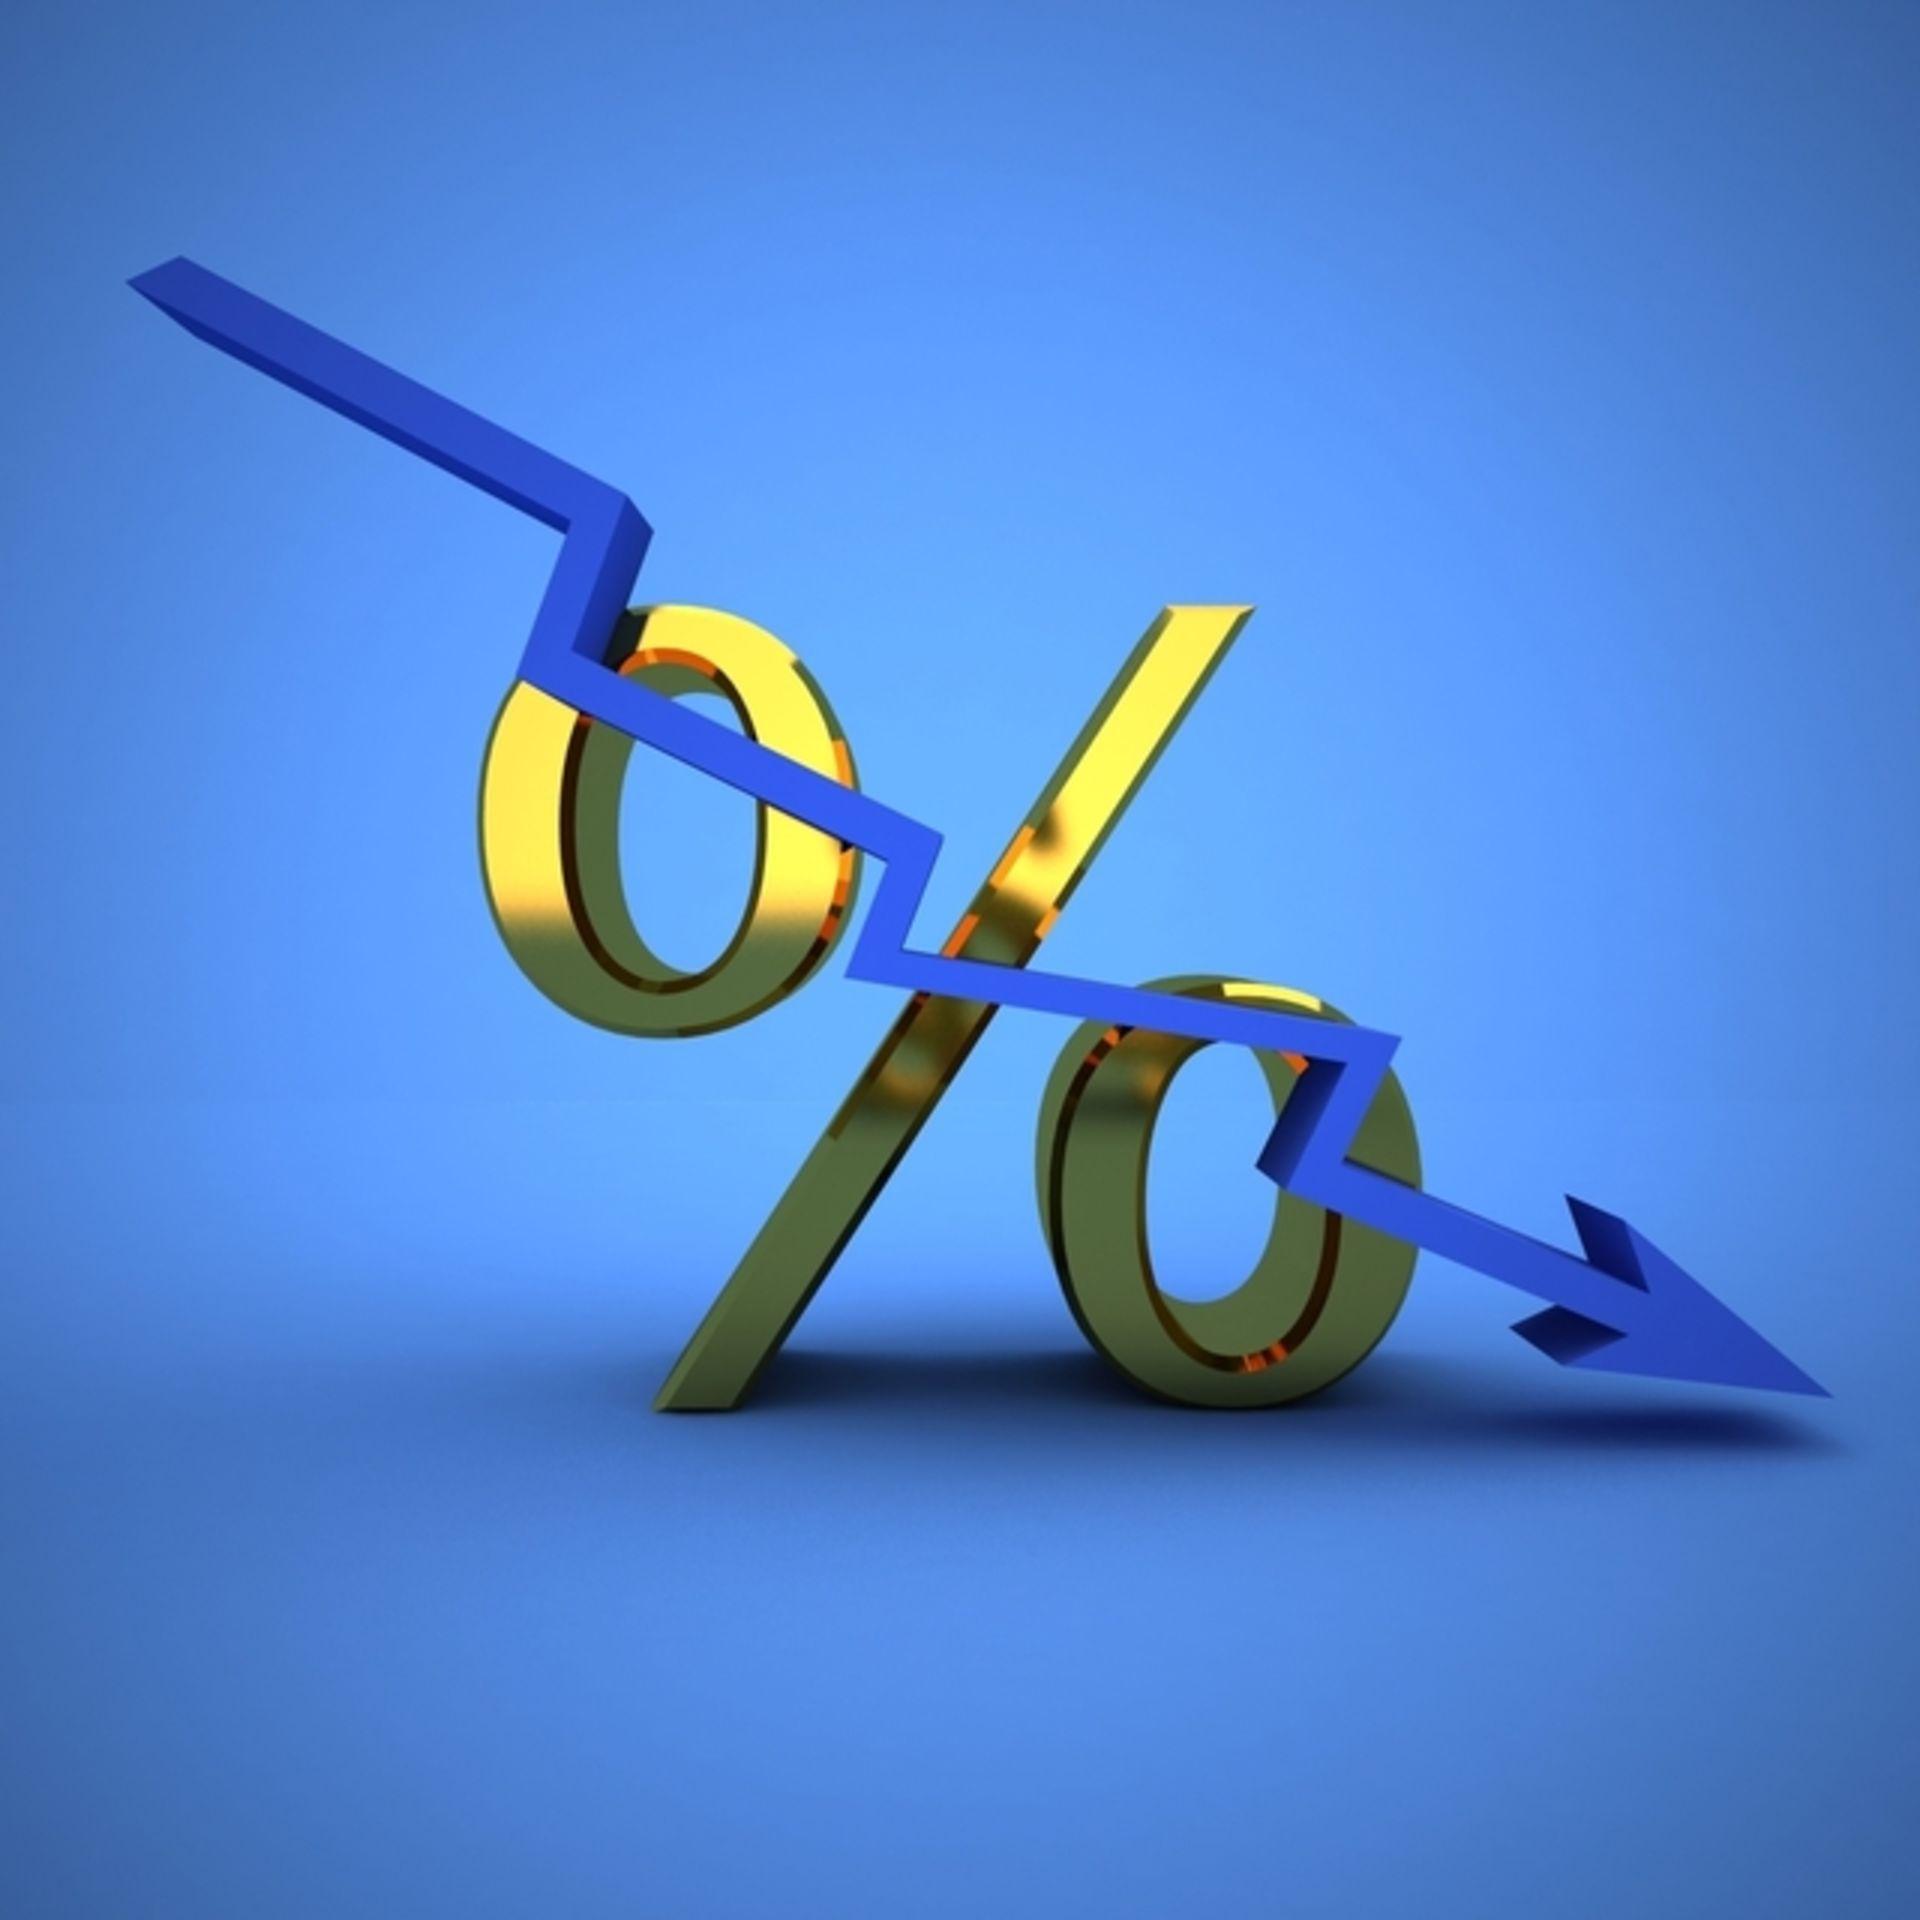 18 year low for mortgage delinquencies.